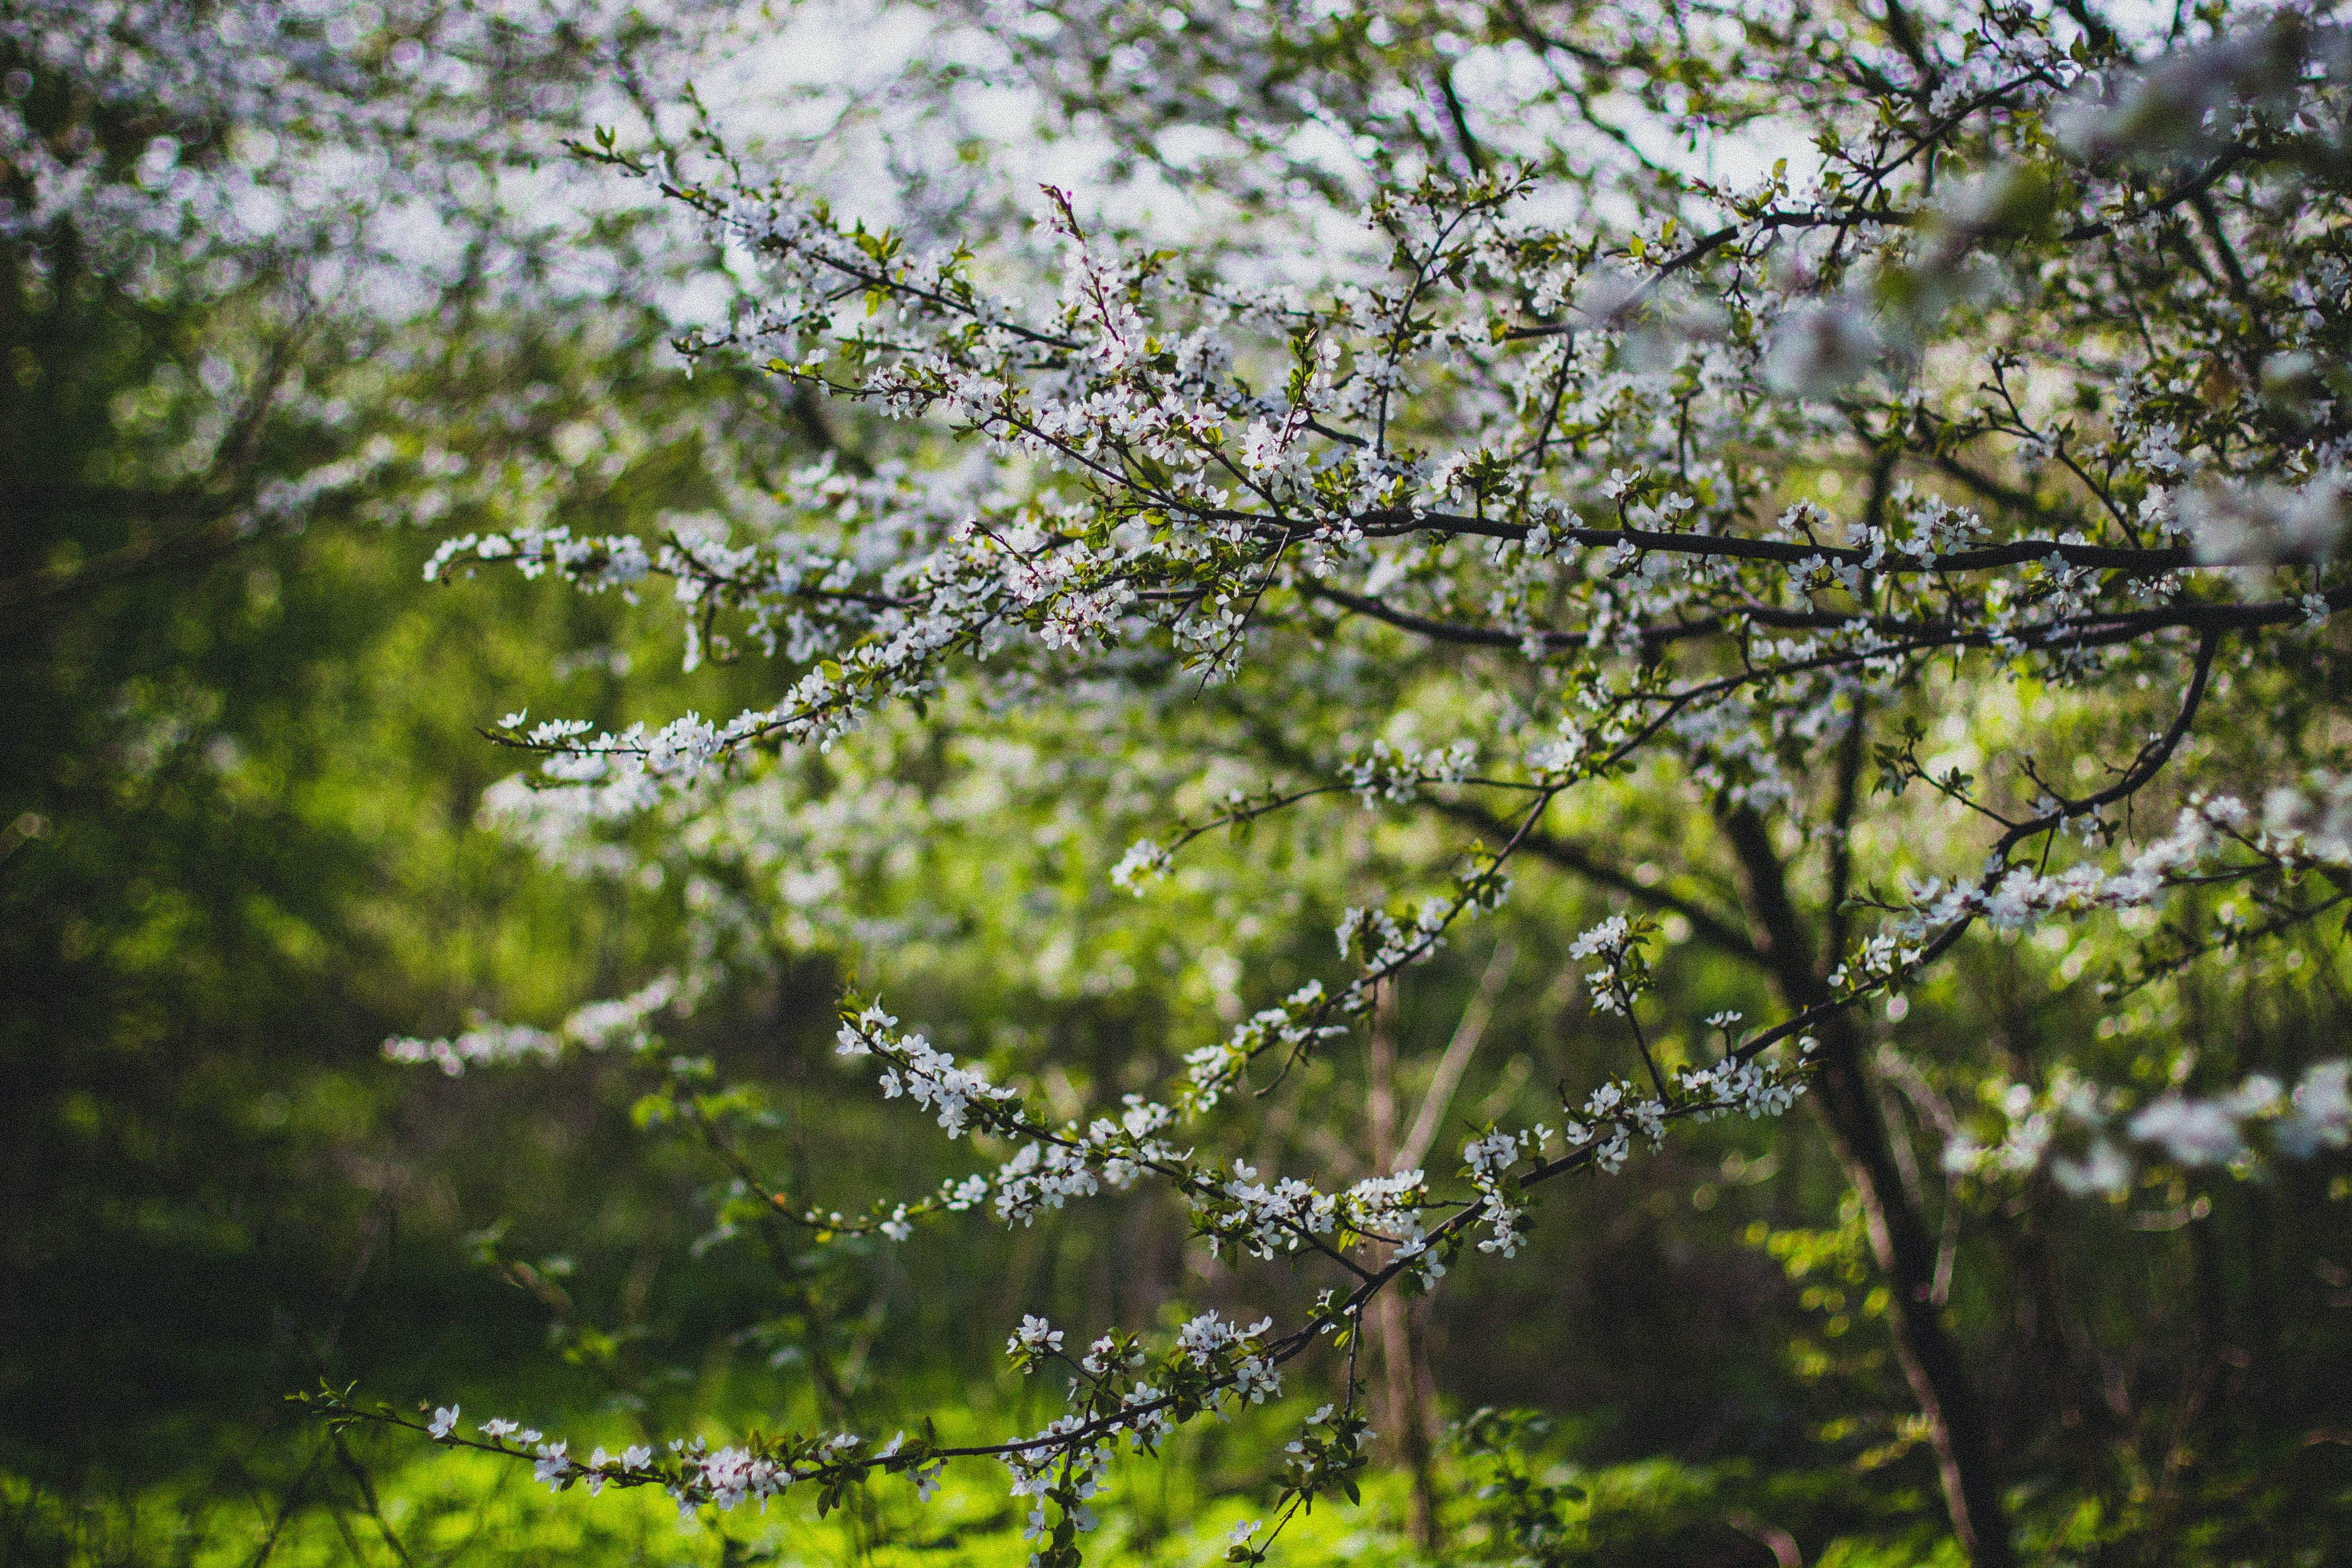 White Cherry Blossom Flowering Tree